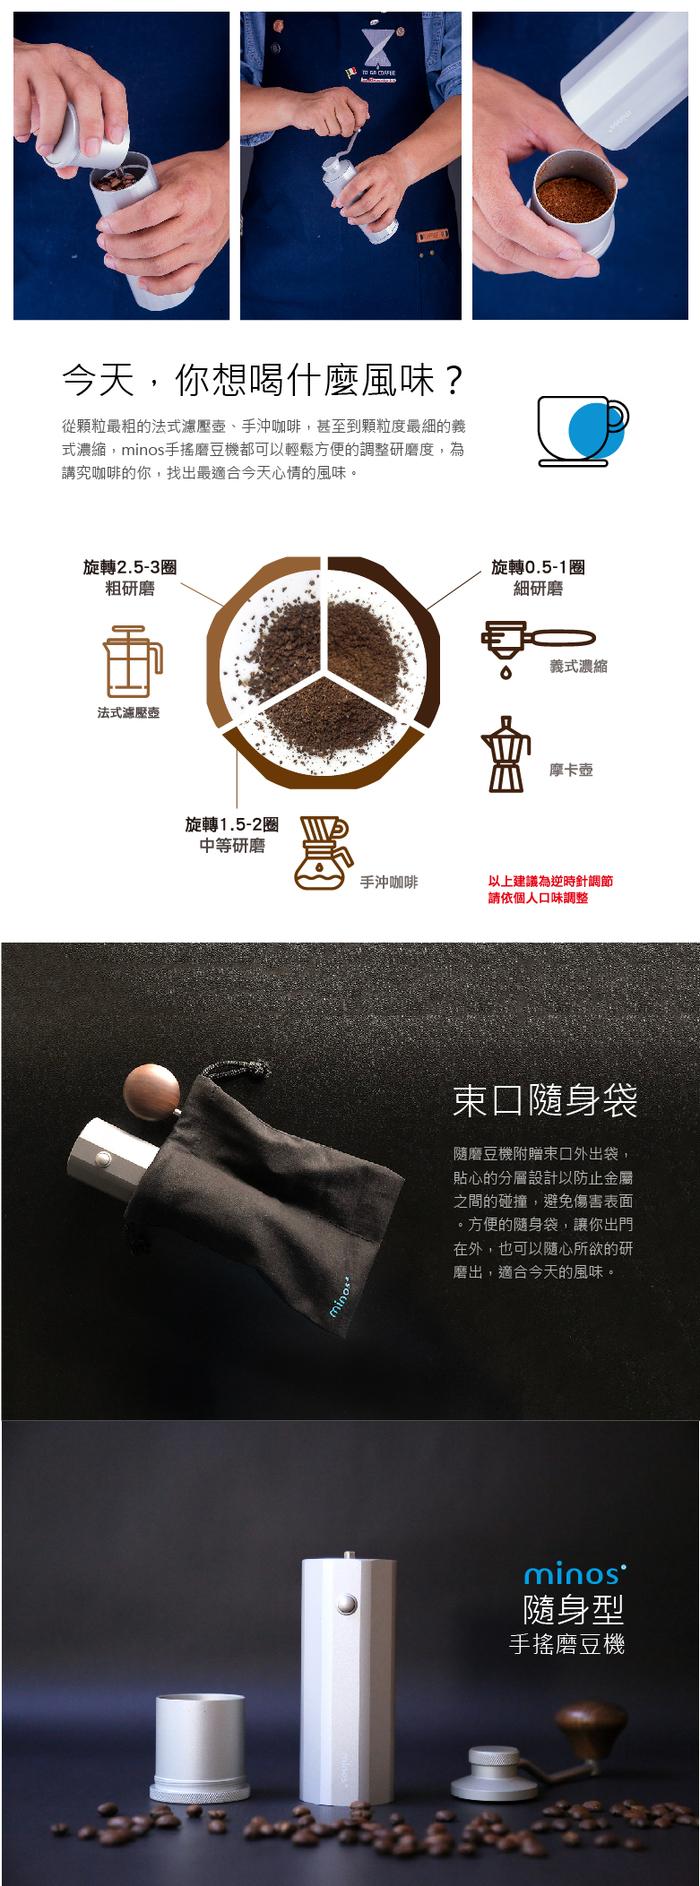 Minos | 手搖磨豆機(黑色)